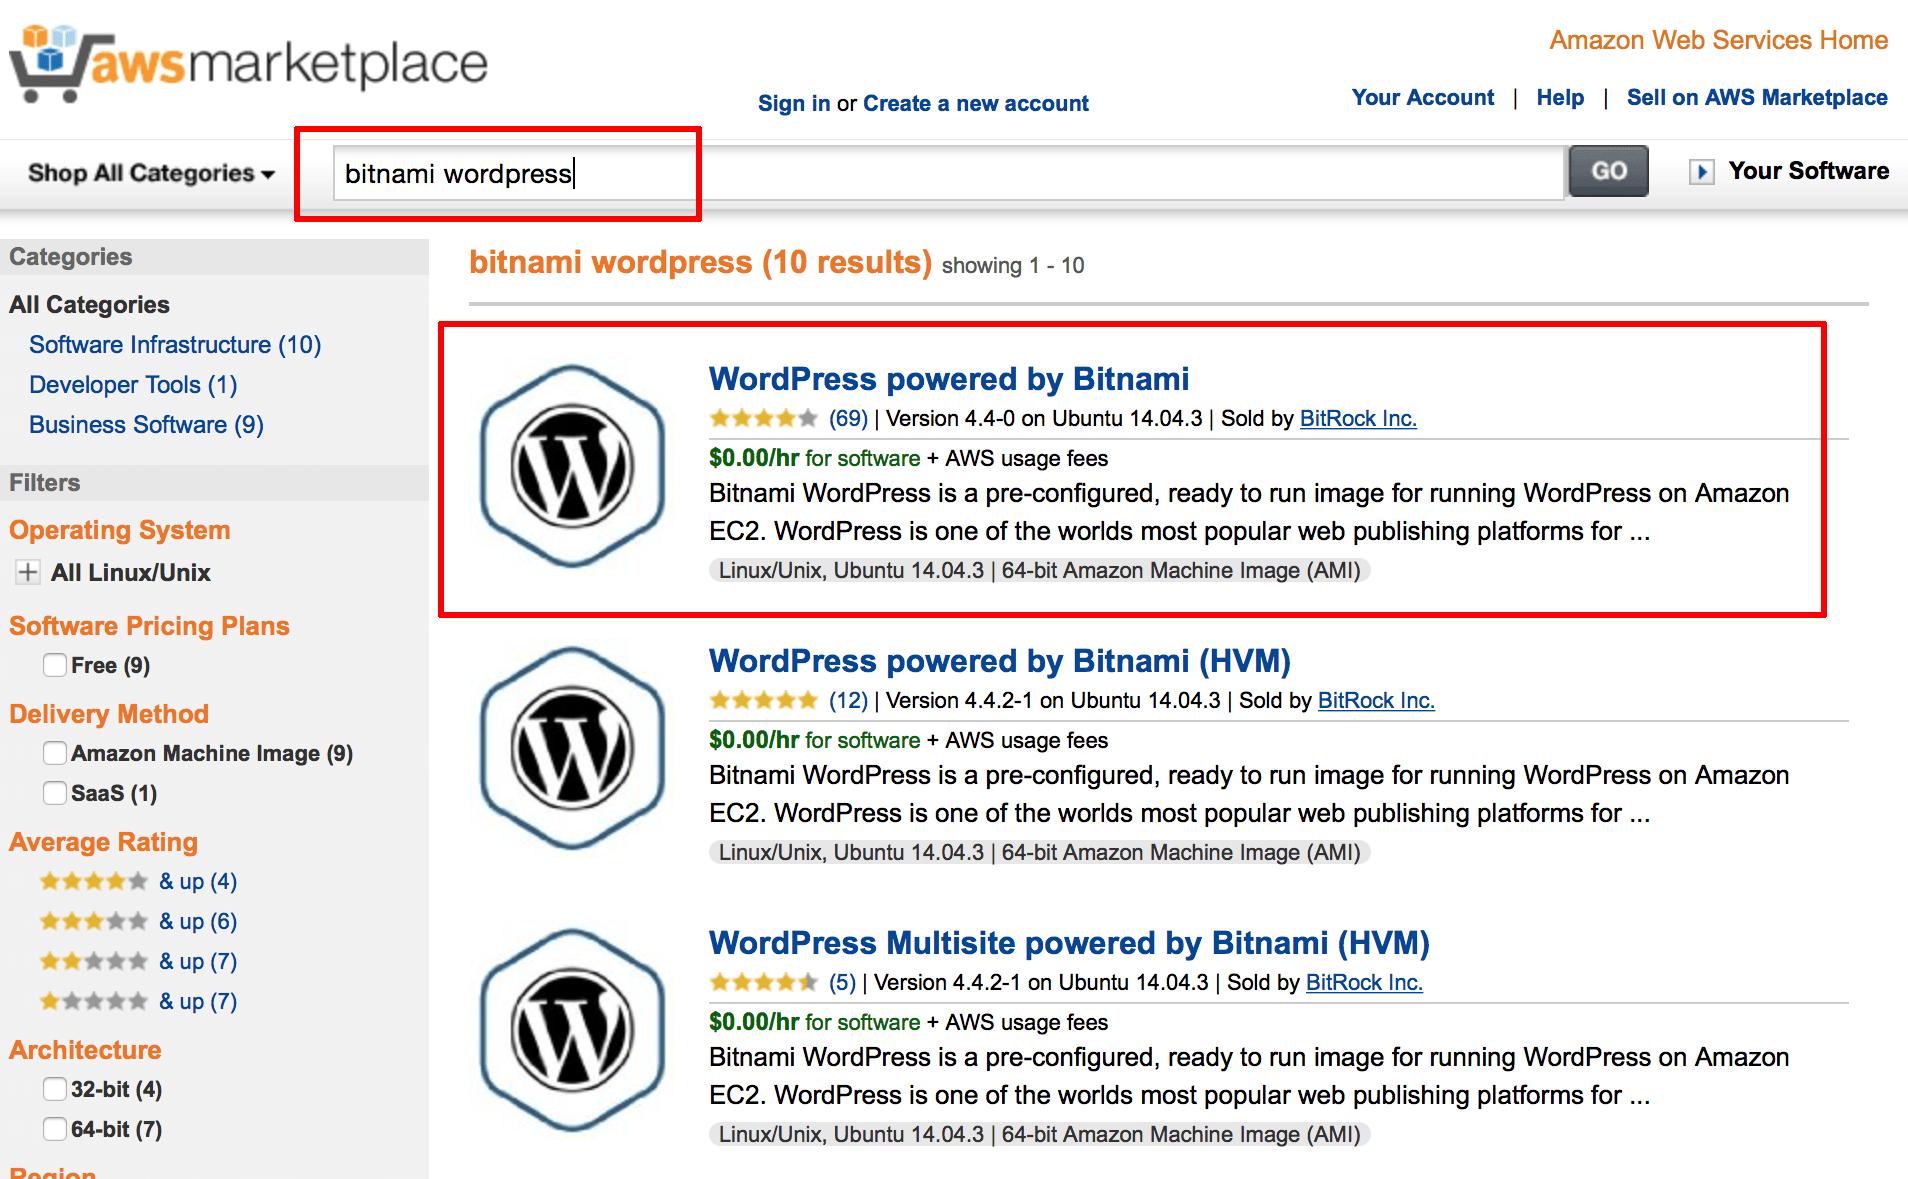 bitnami application pricing